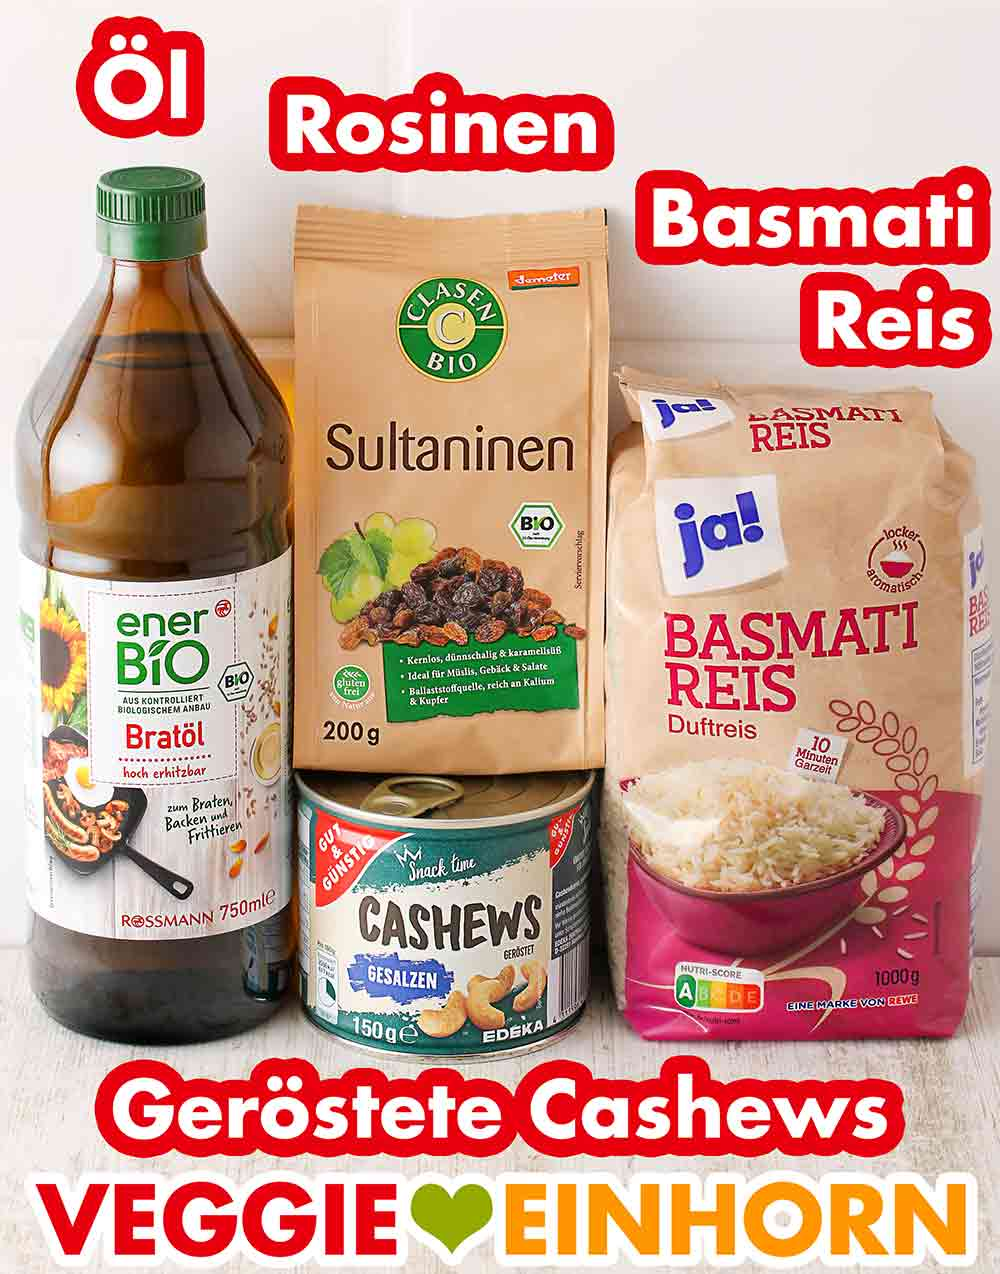 Öl, Rosinen, Basmati Reis, geröstete und gesalzene Cashews